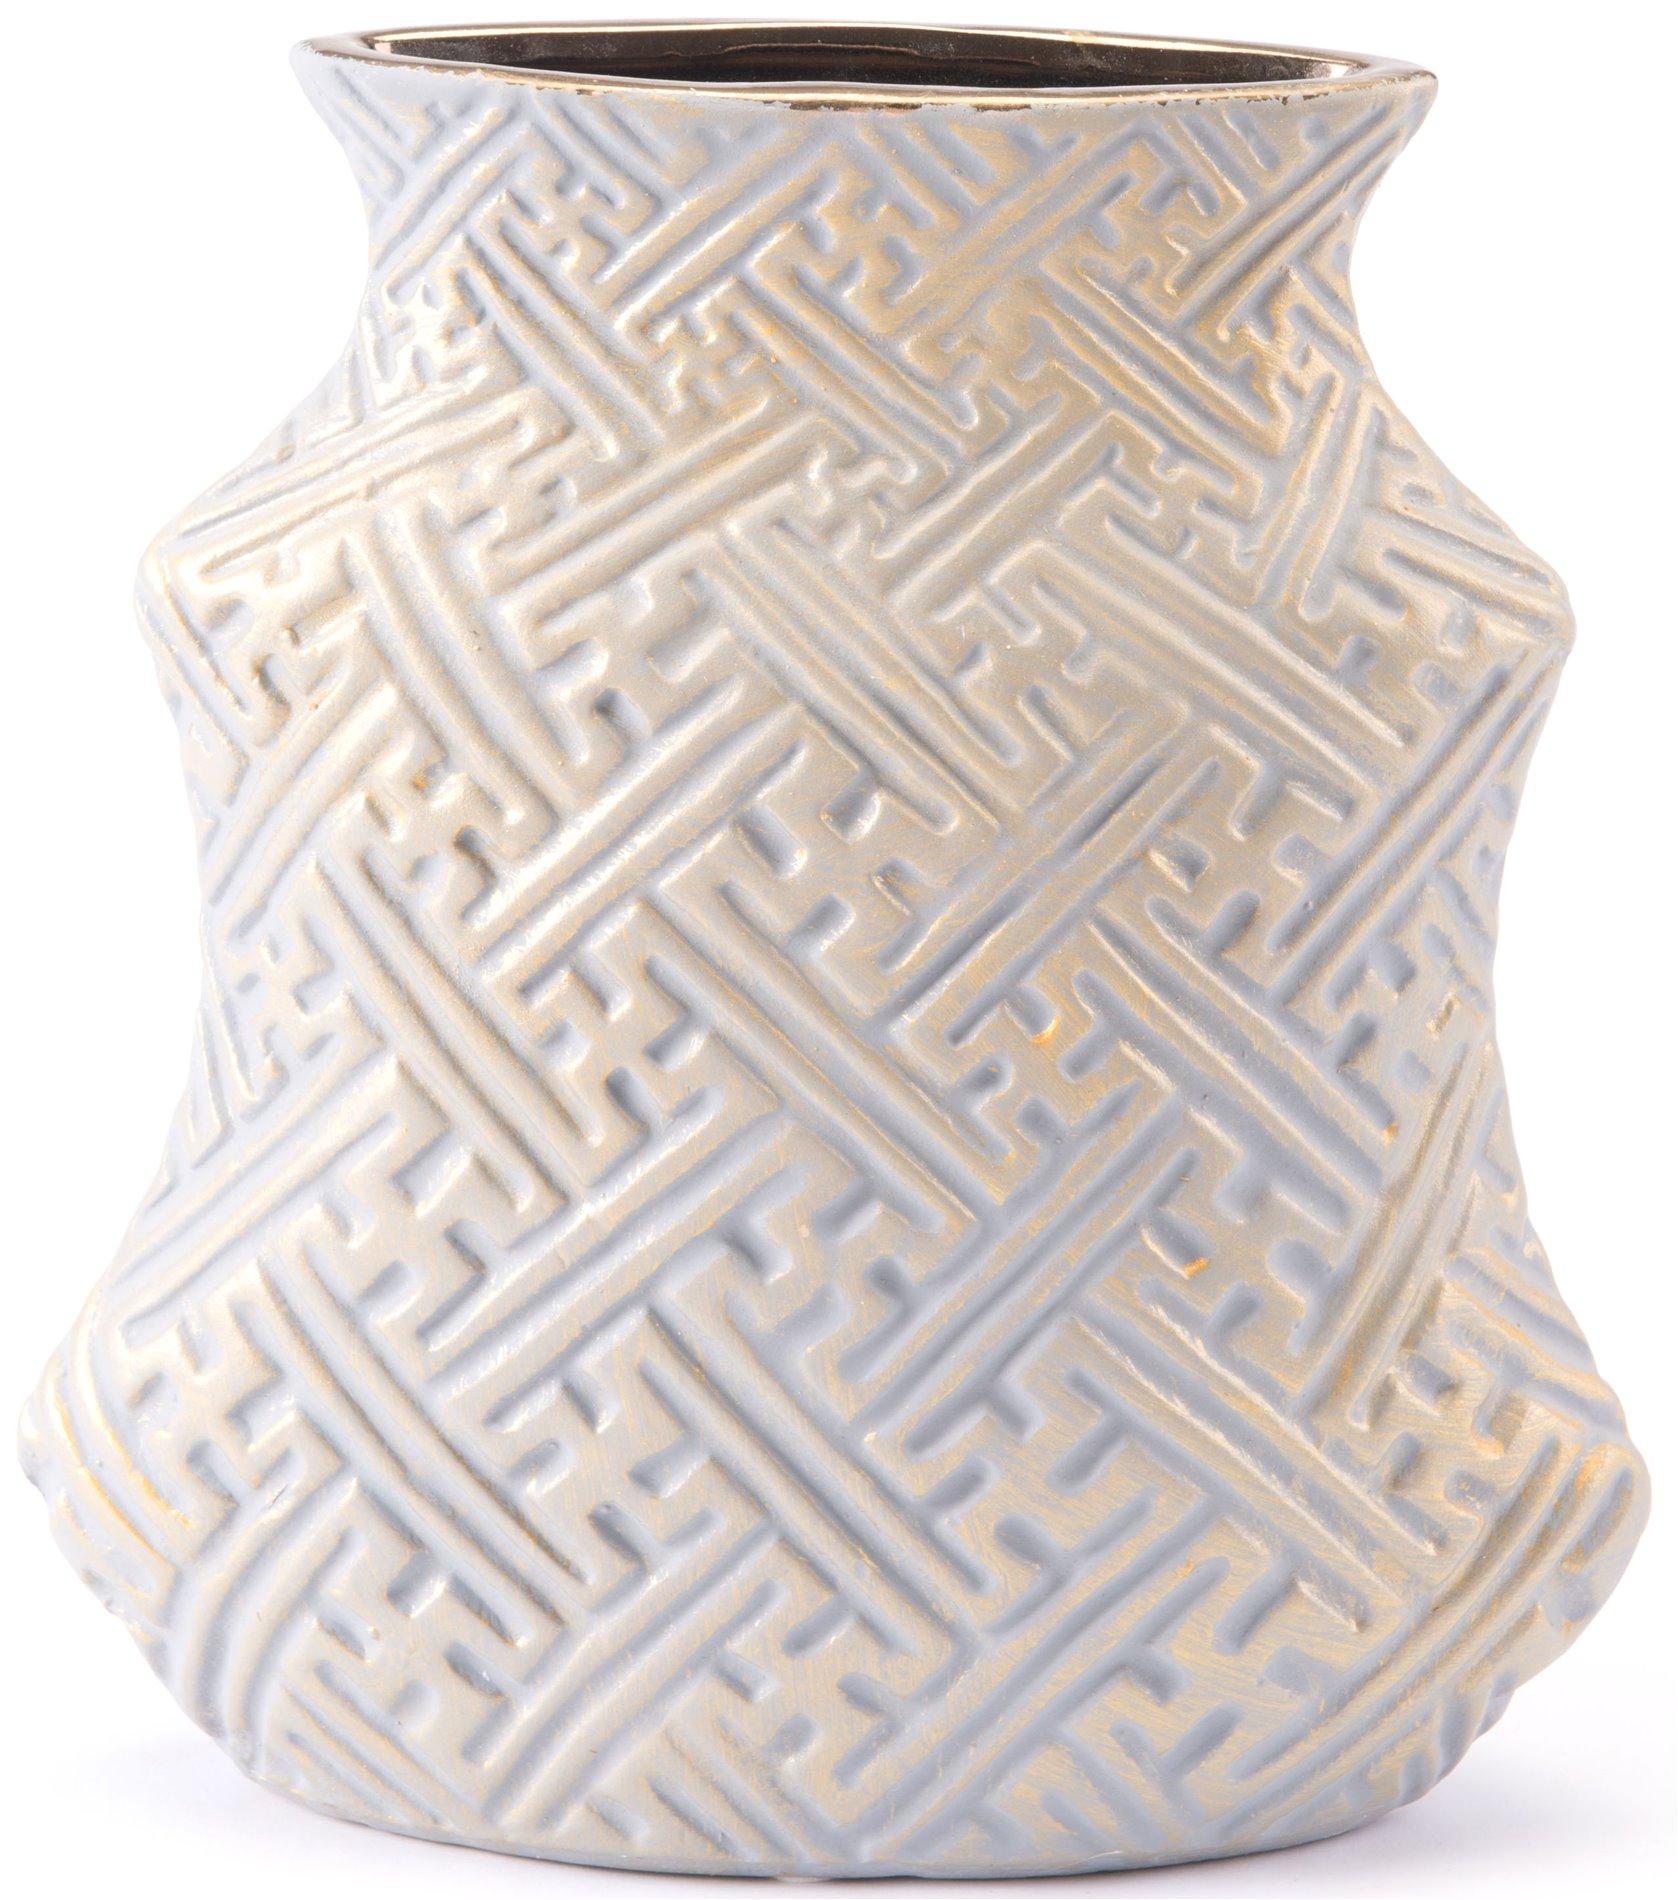 Zuo Modern A10271 Arcadia Ceramic Vase